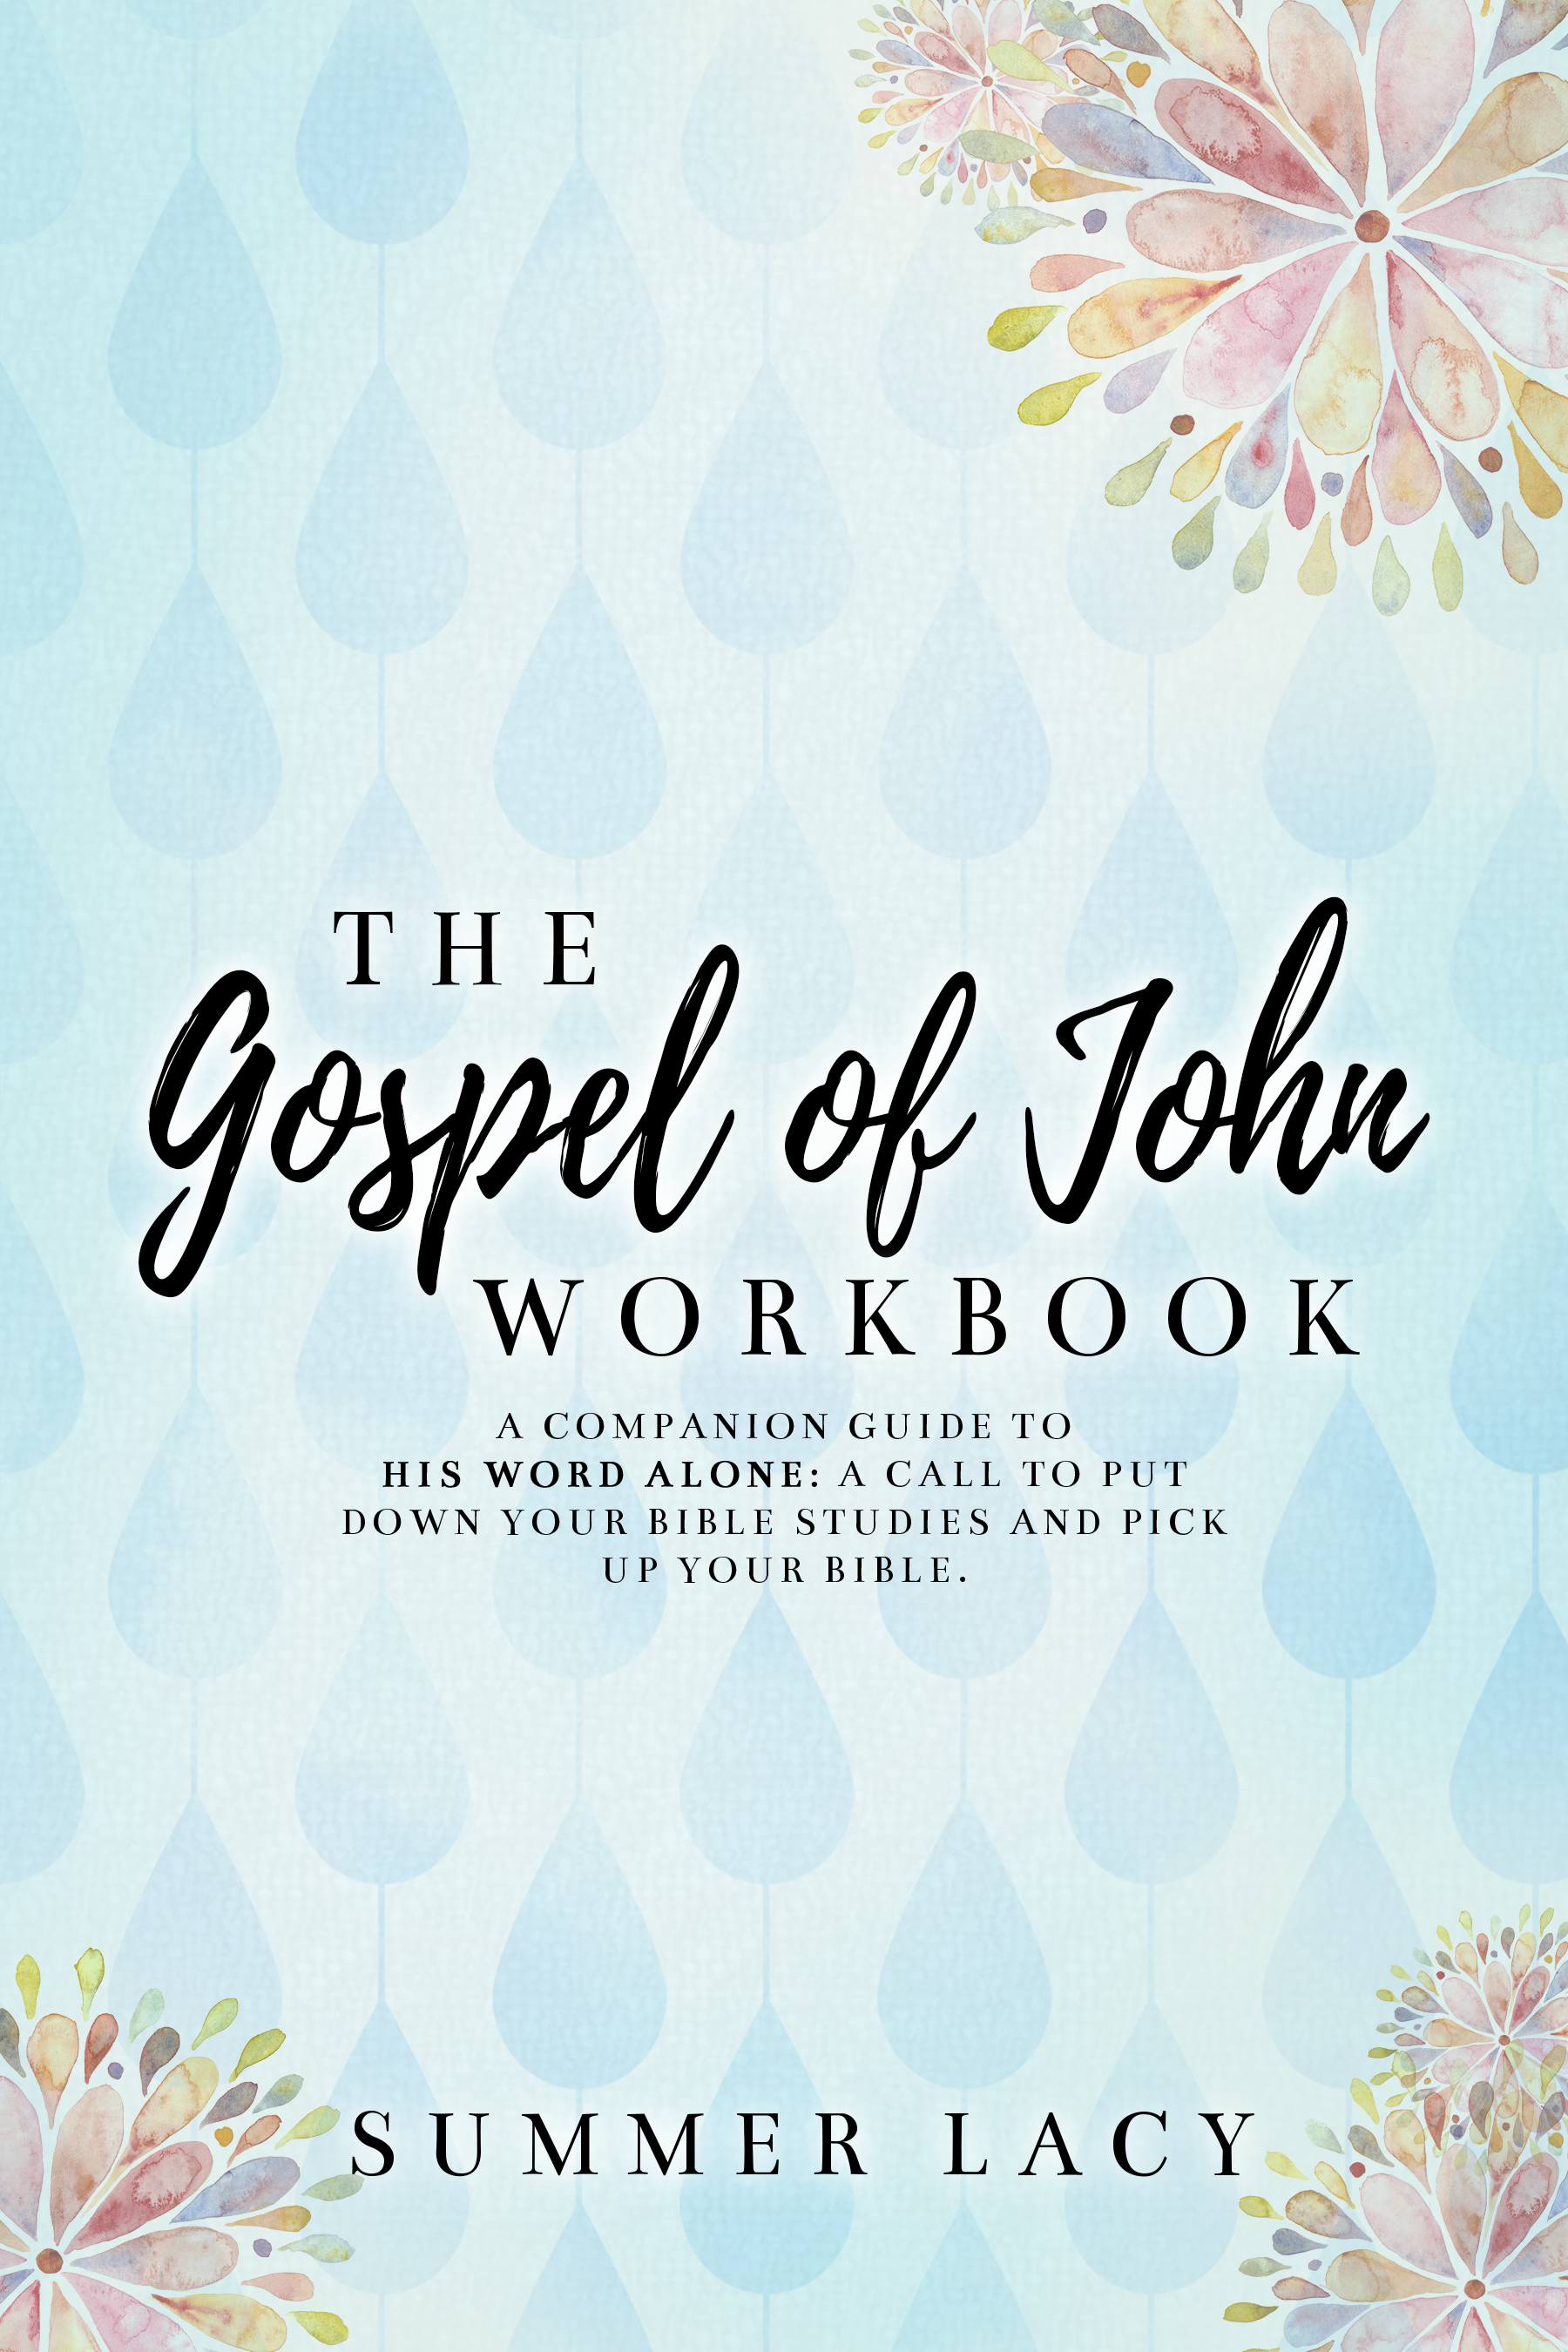 Gospel of John Workbook cover.png